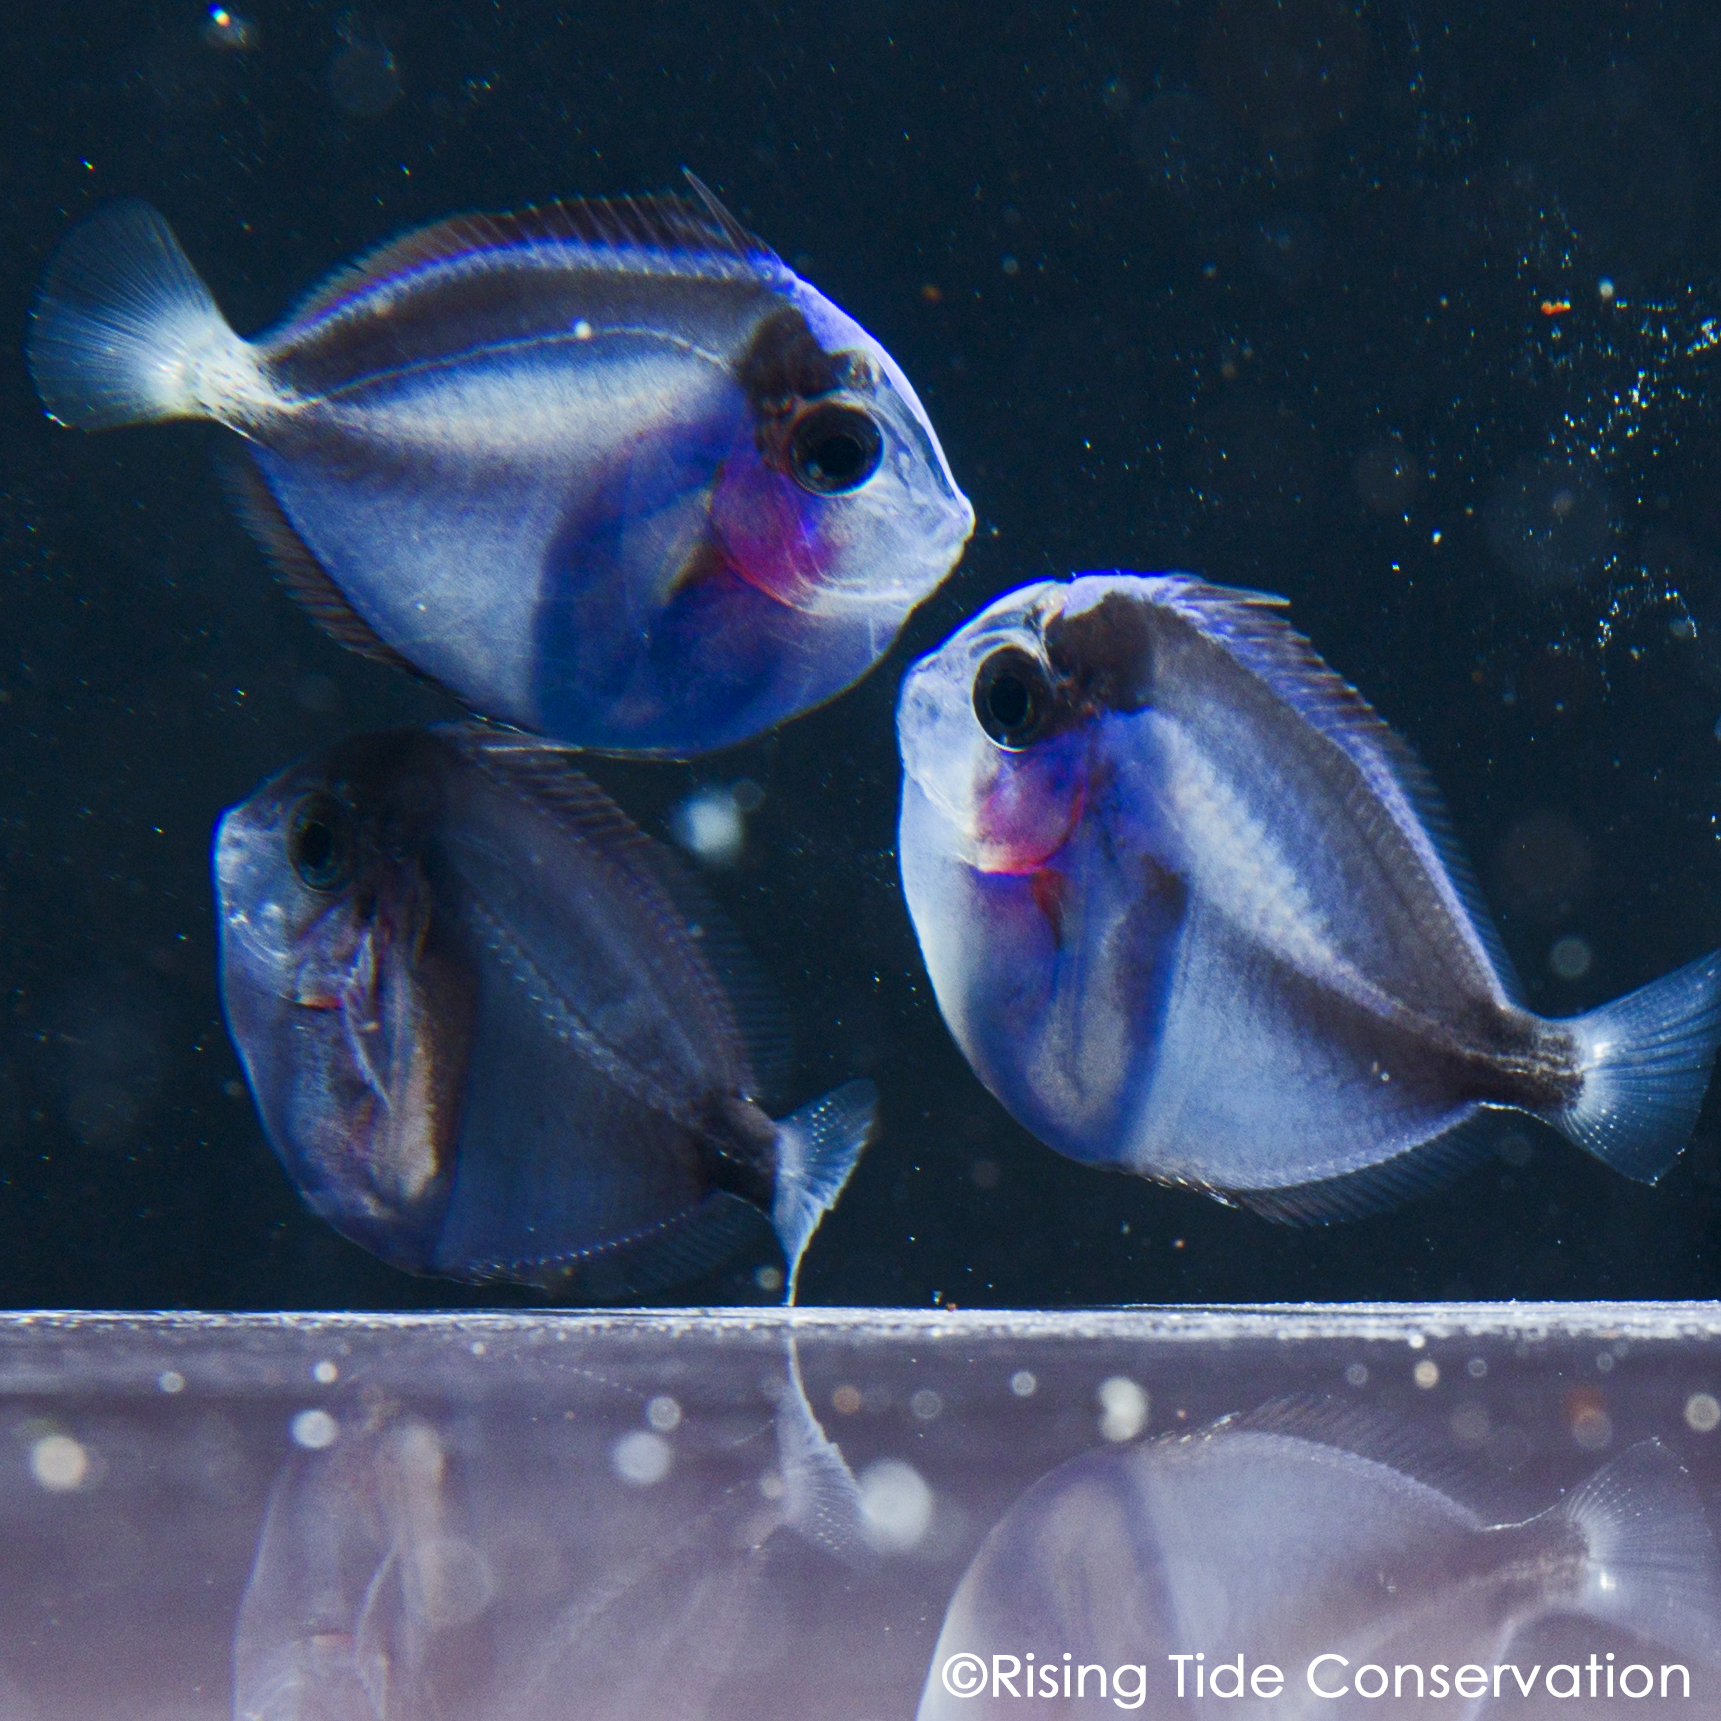 aquacultured fish rising tide conservation